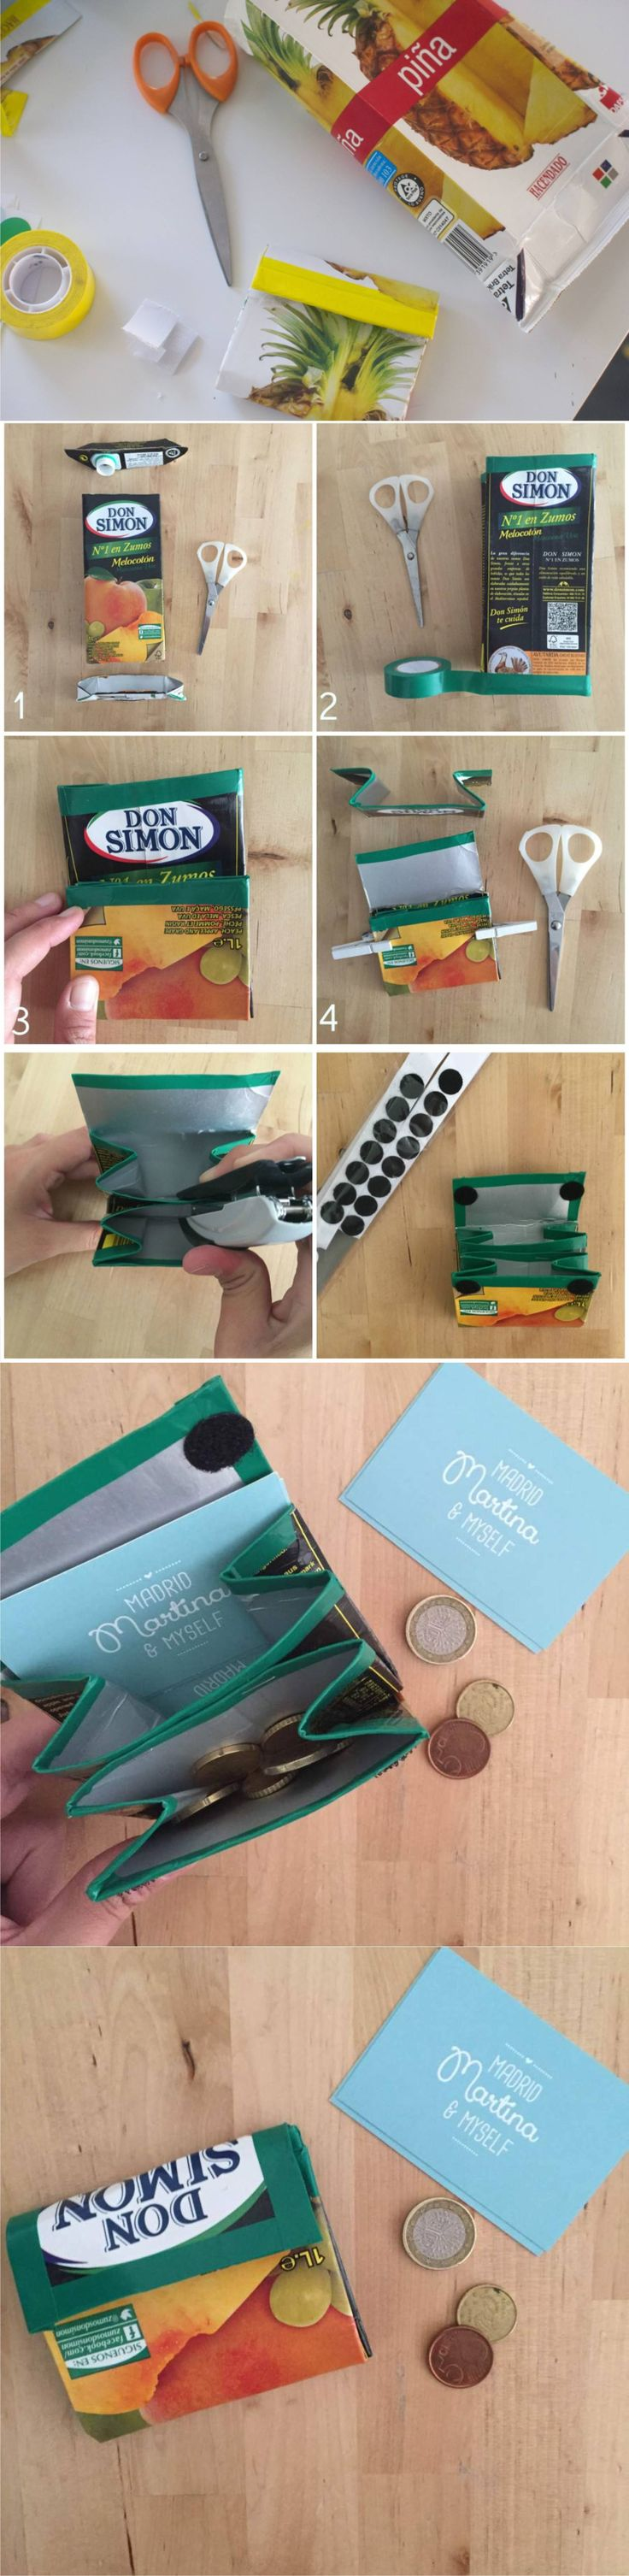 monedero tetrabrik DIY muy ingenioso 2